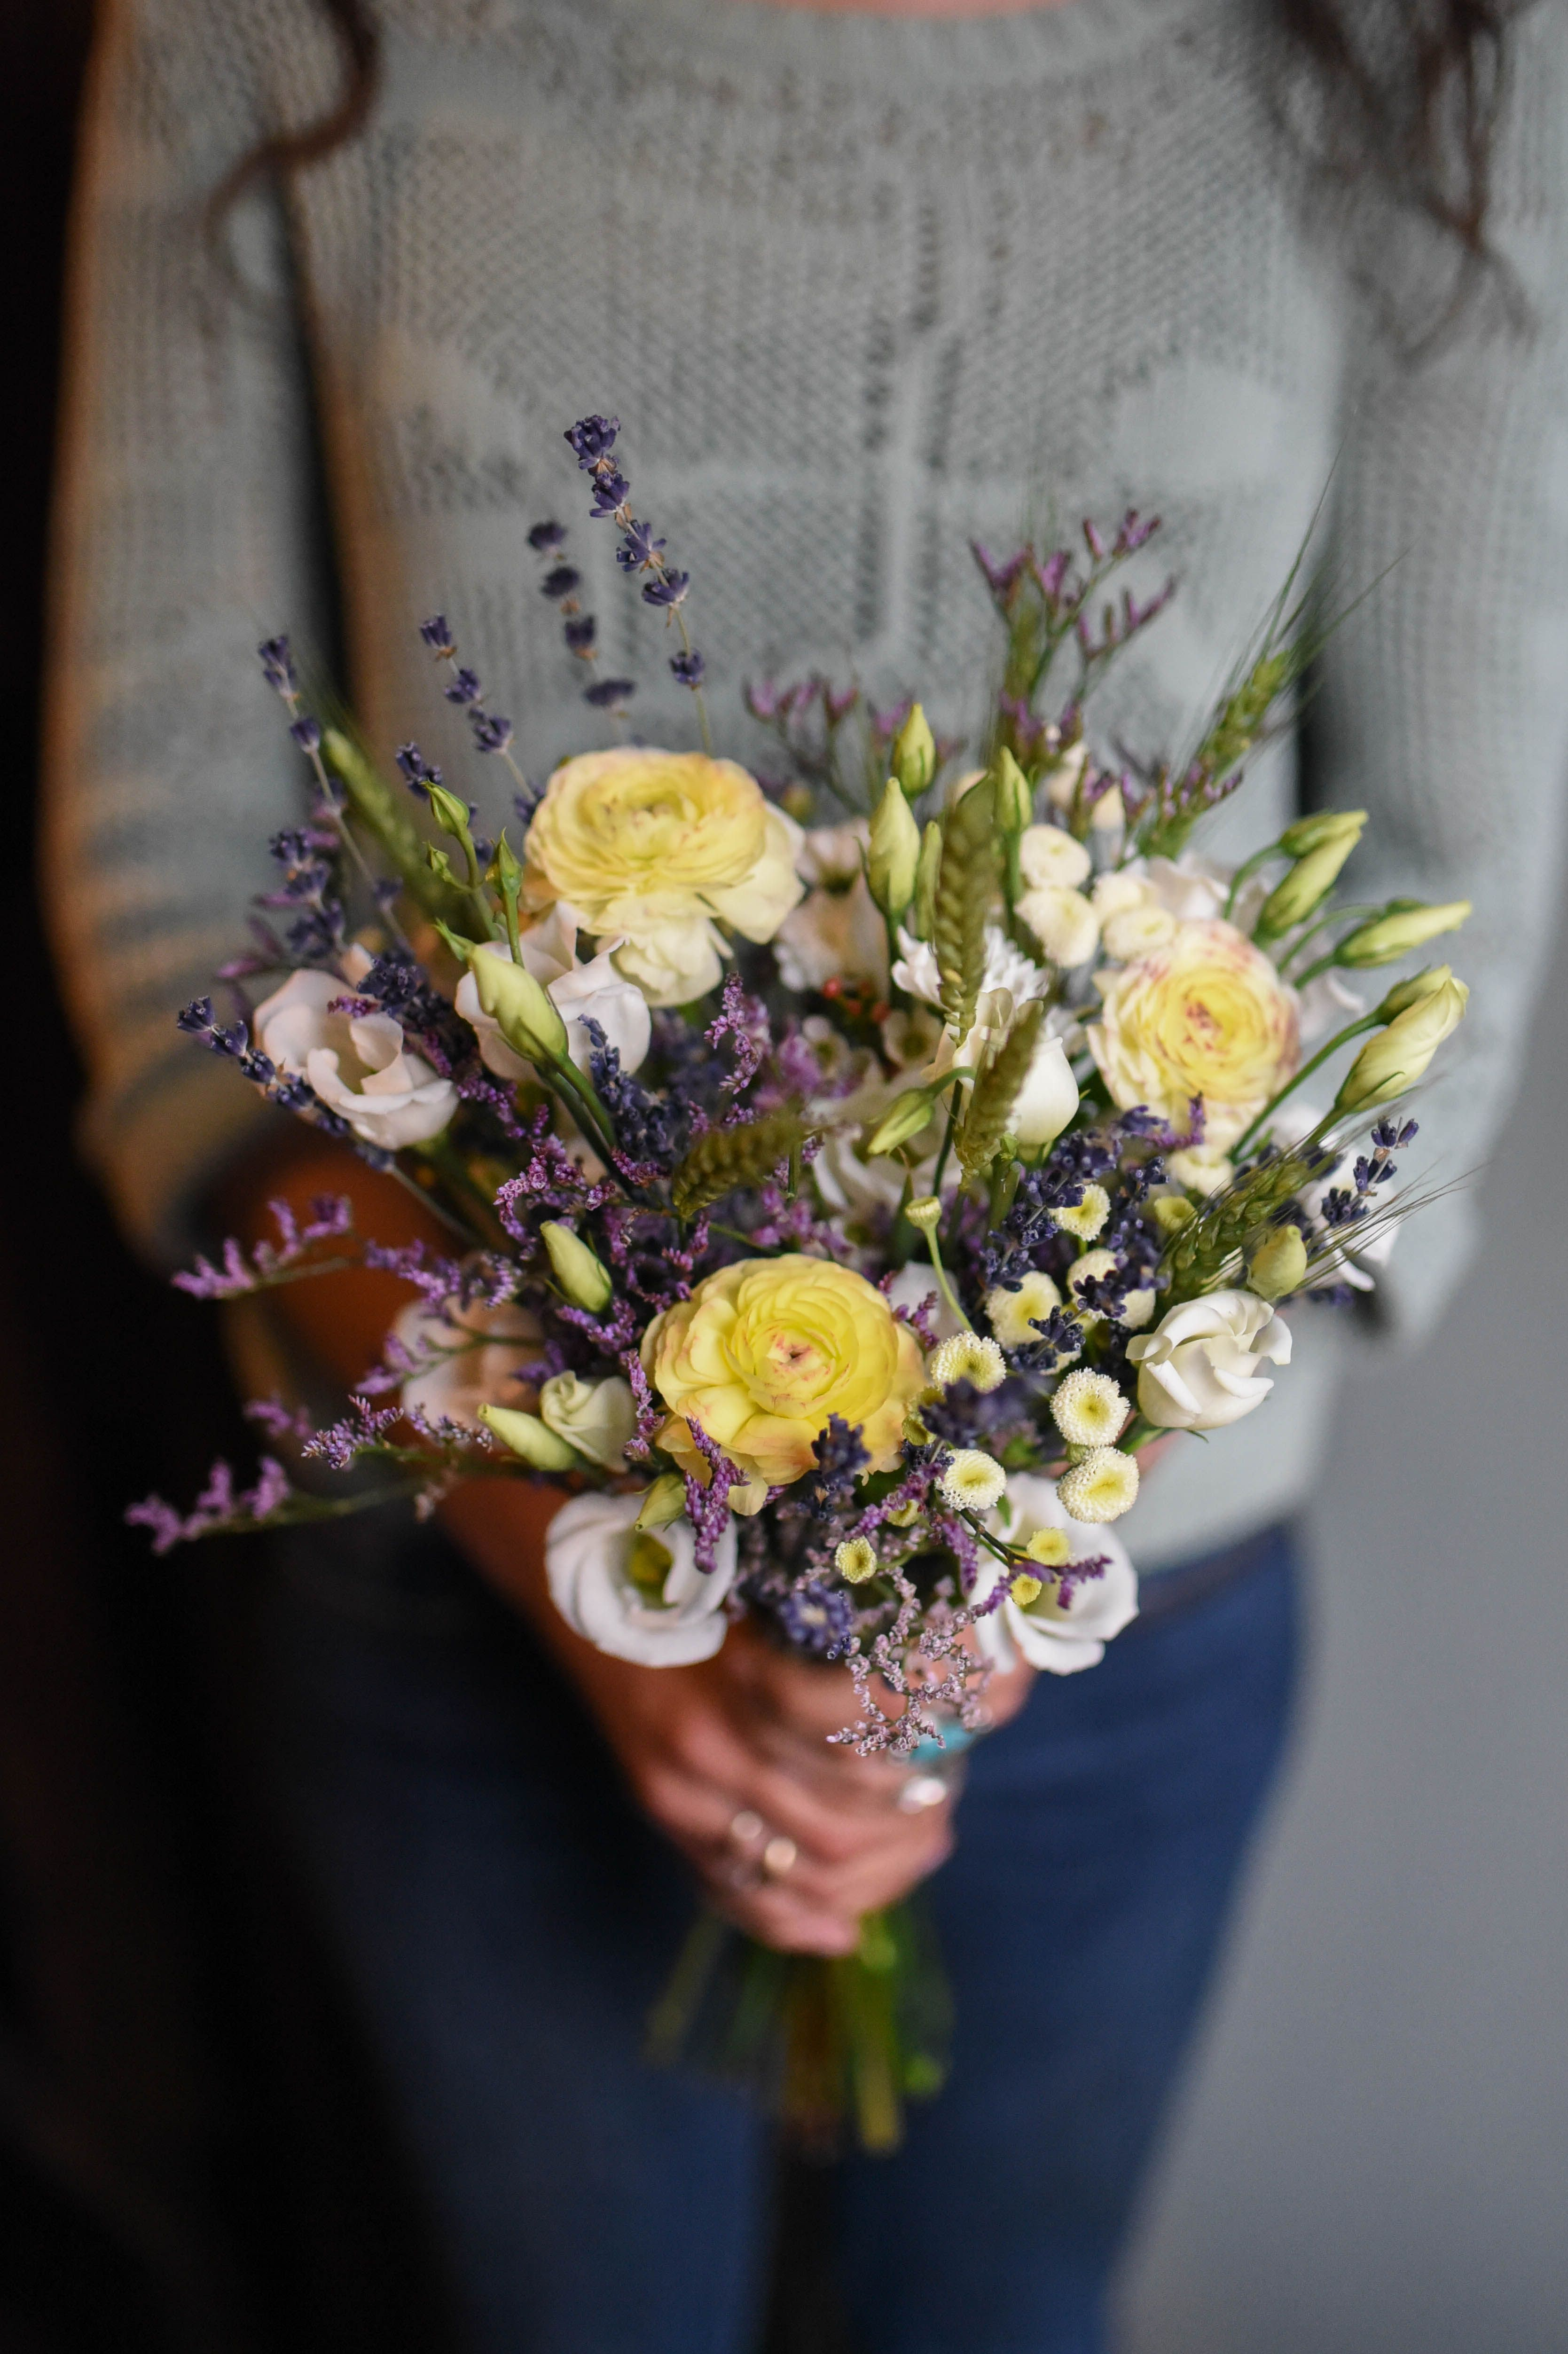 Seaside wildflower wedding bouquet featuring wheat